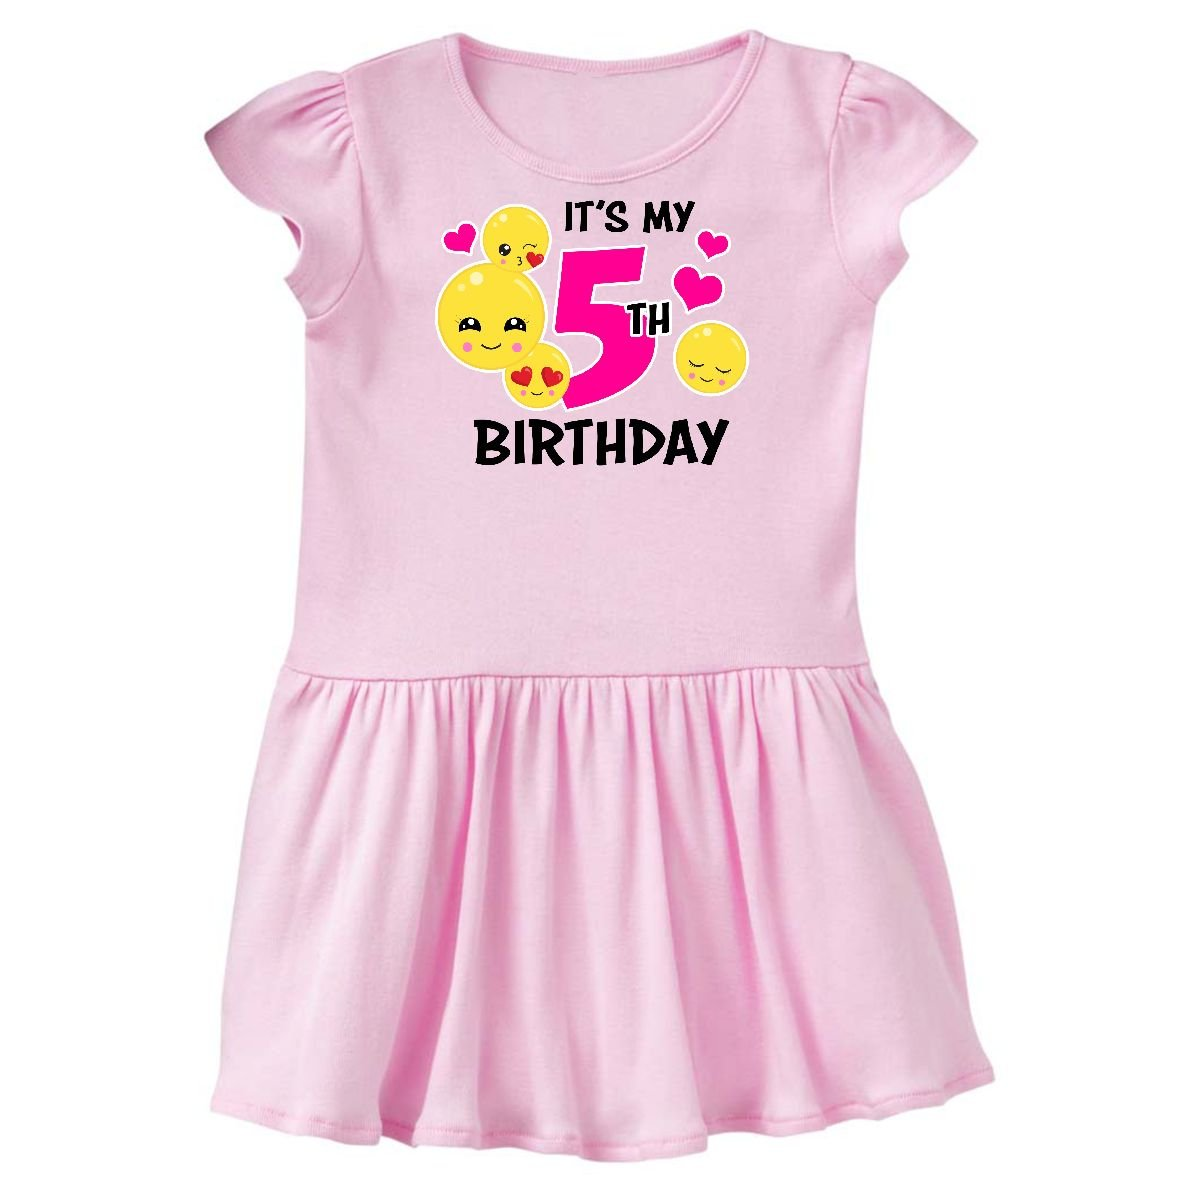 de99752f92b ... inktastic - Its My 5th Birthday Emojis Toddler Dress 14-196261-198 ...